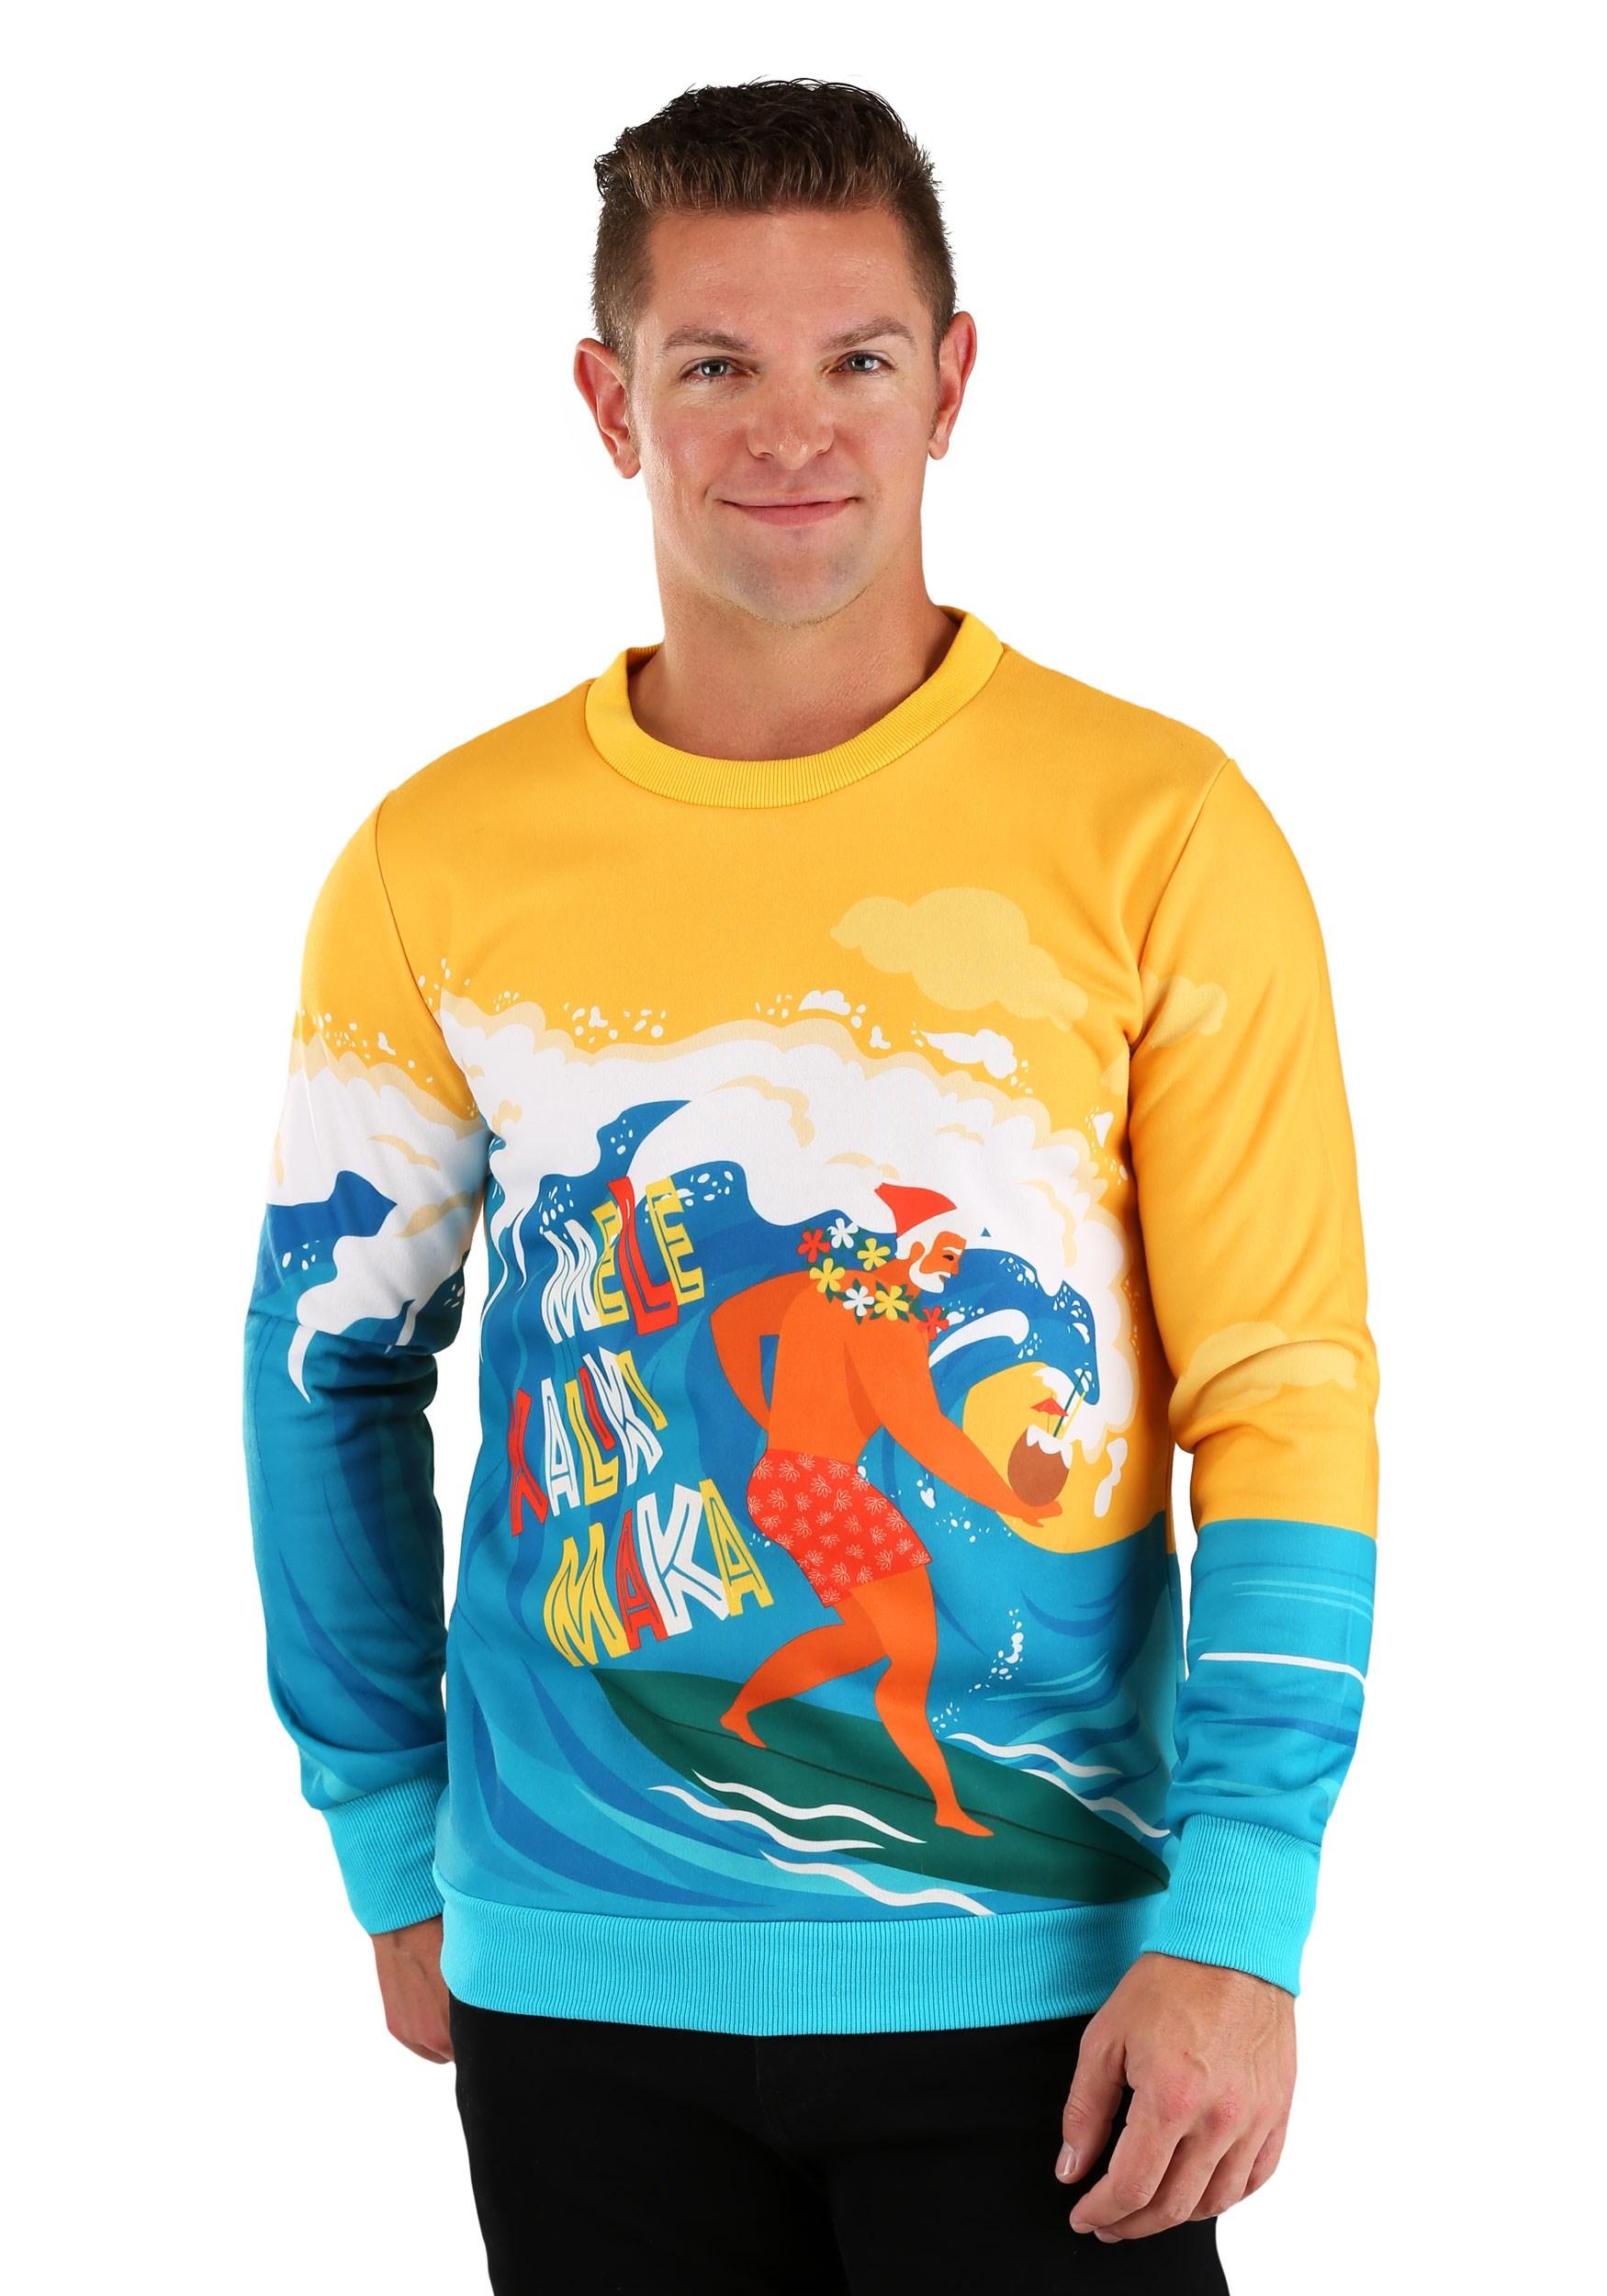 Mele Kalikimaka Surfing Santa Ugly Christmas Sweater for Adults